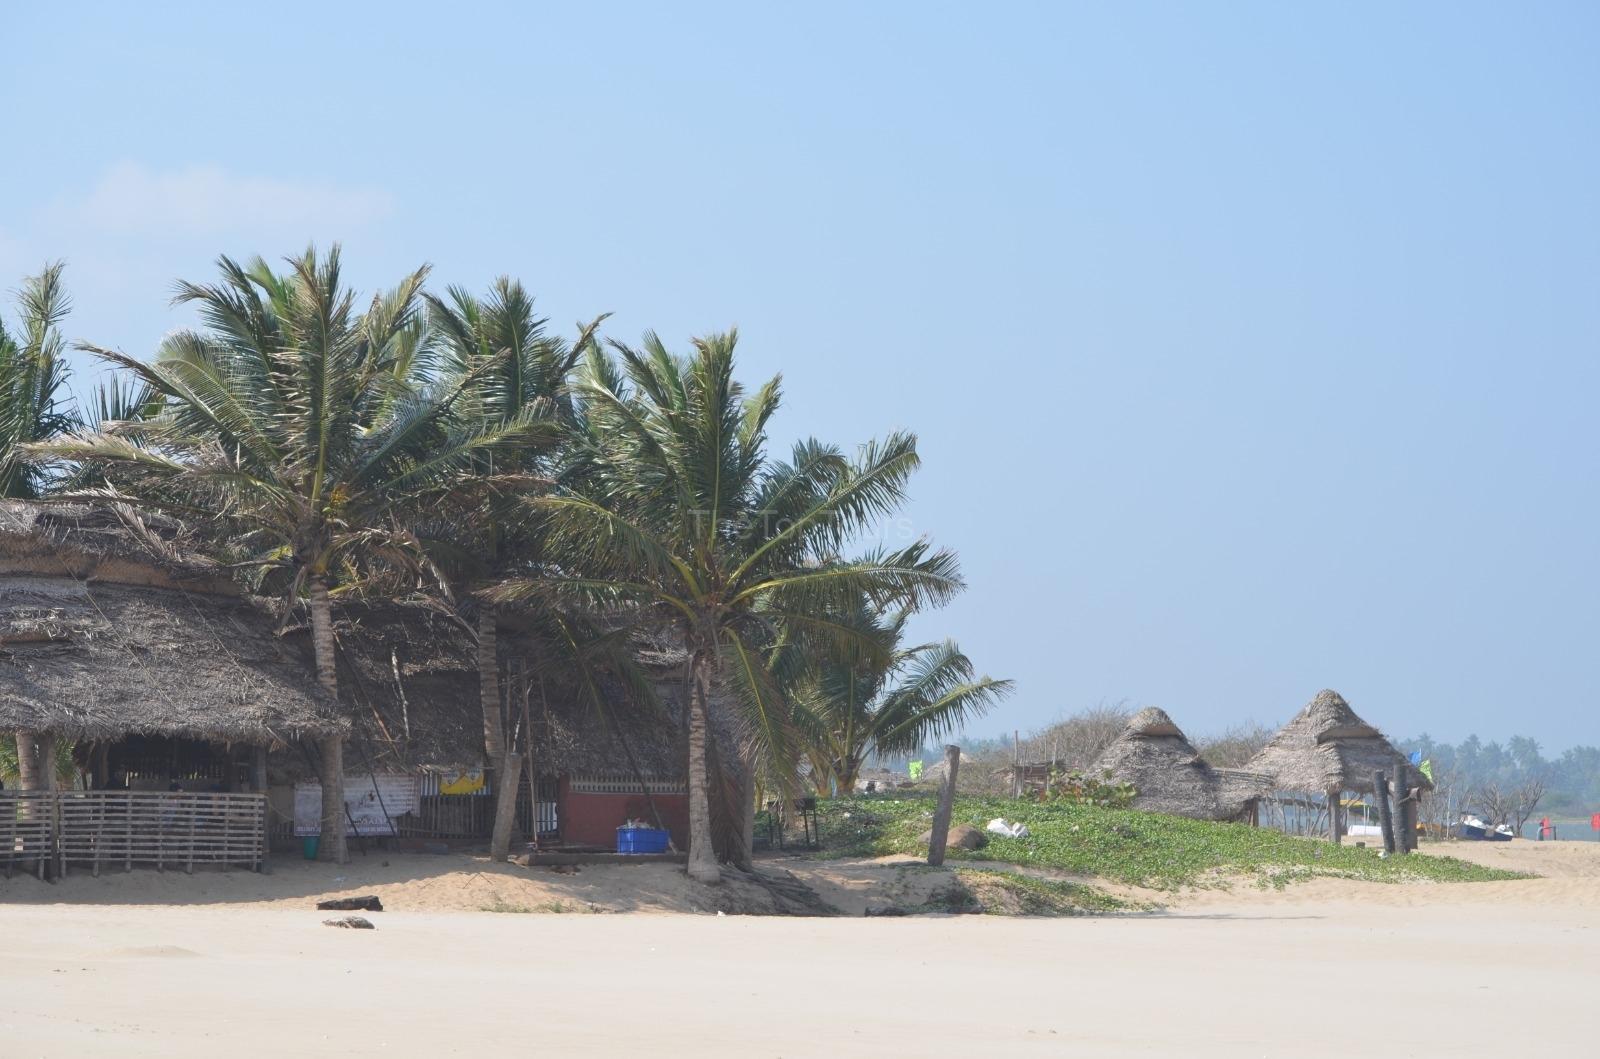 Thoothukudi Beach Beautiful Sea Shore With Coconut Trees